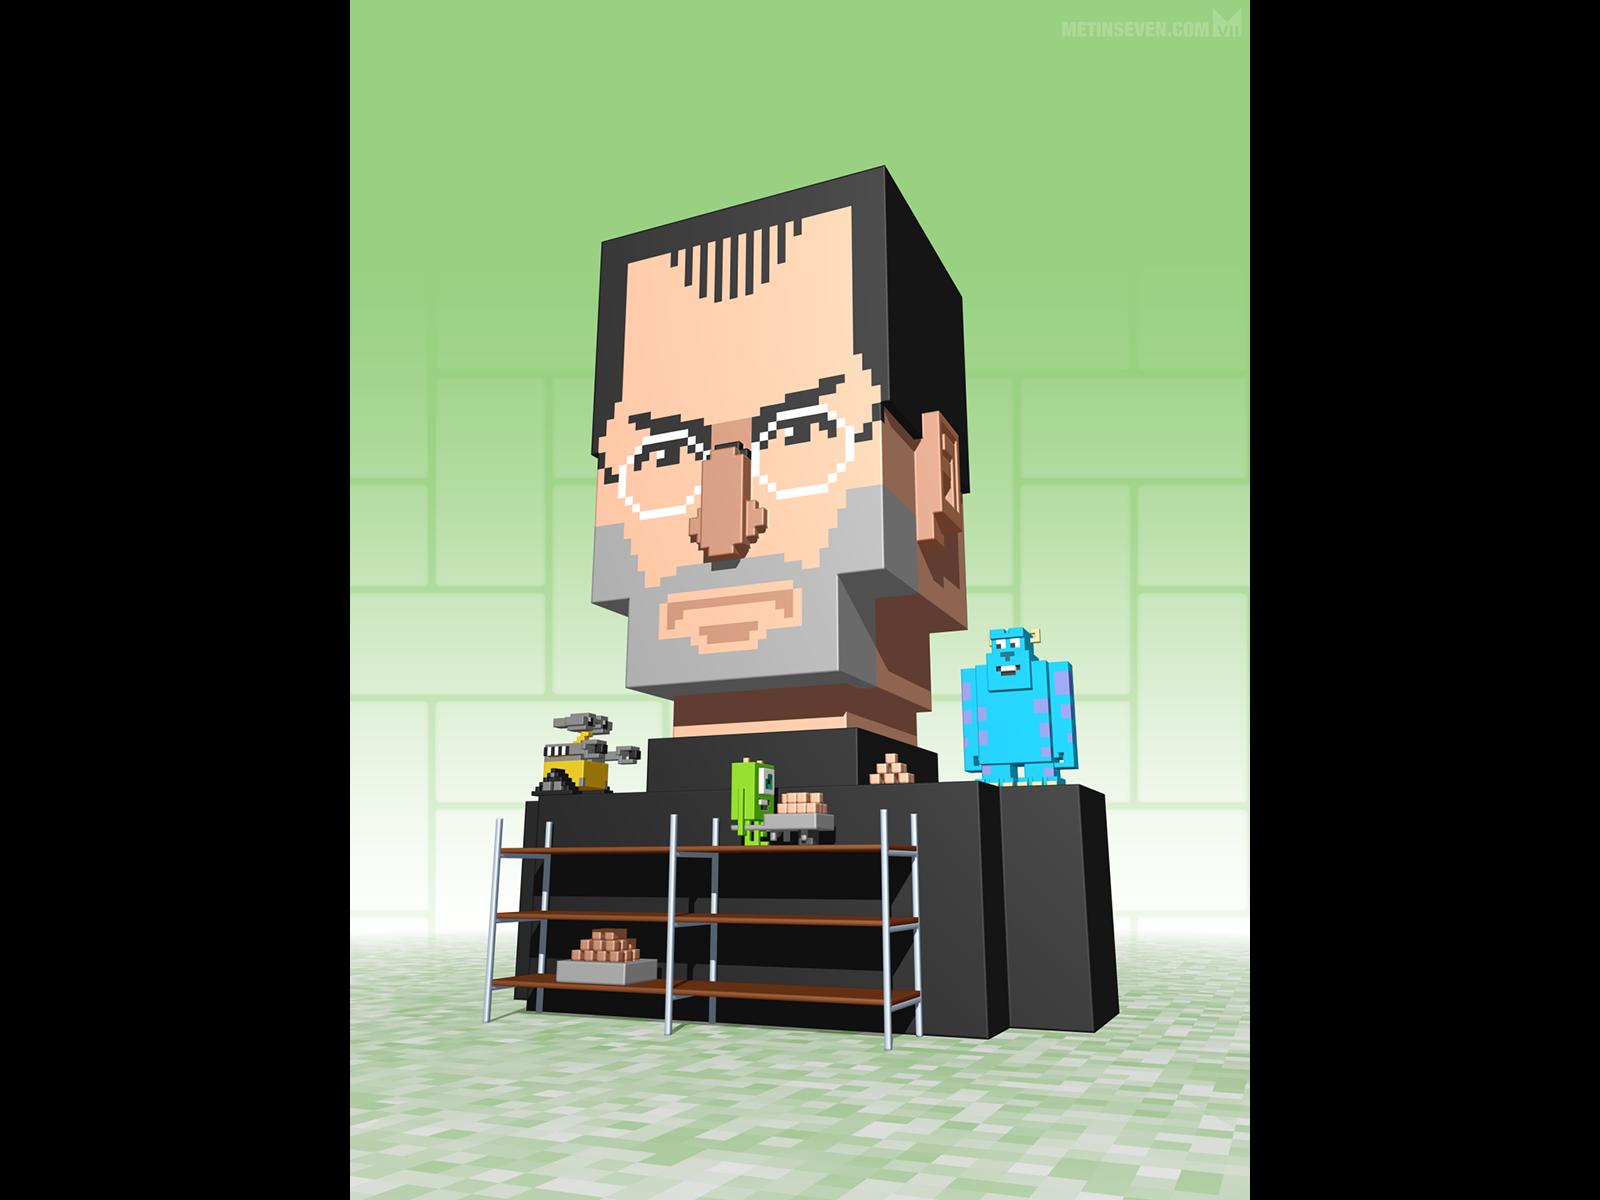 Metin seven 3d pixel artist voxel illustration steve jobs pixar